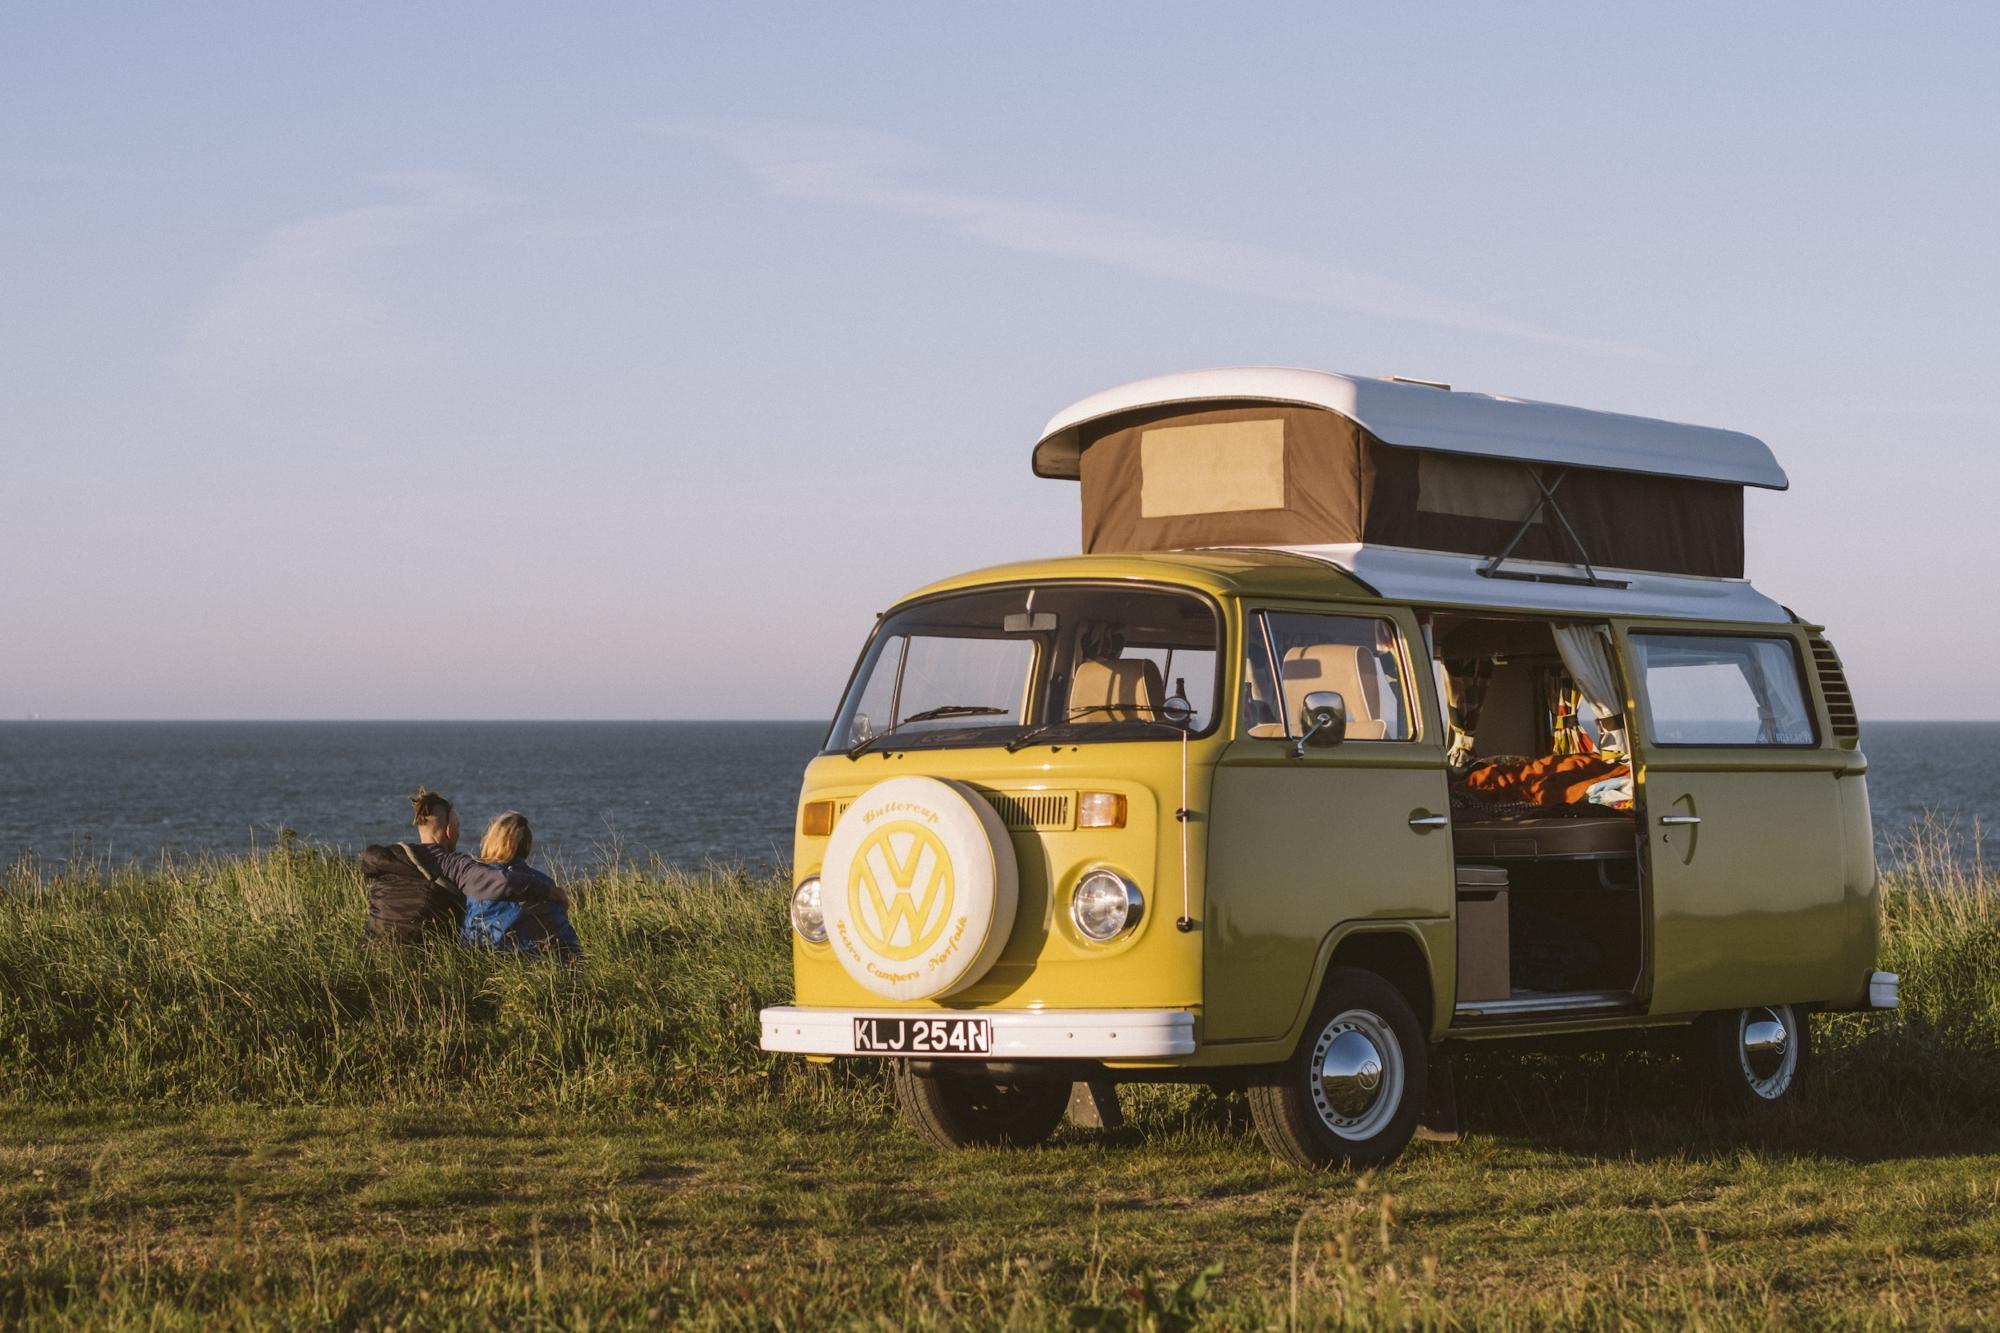 Vintage Campervan Hire | Retro Campers & Classic Campervans